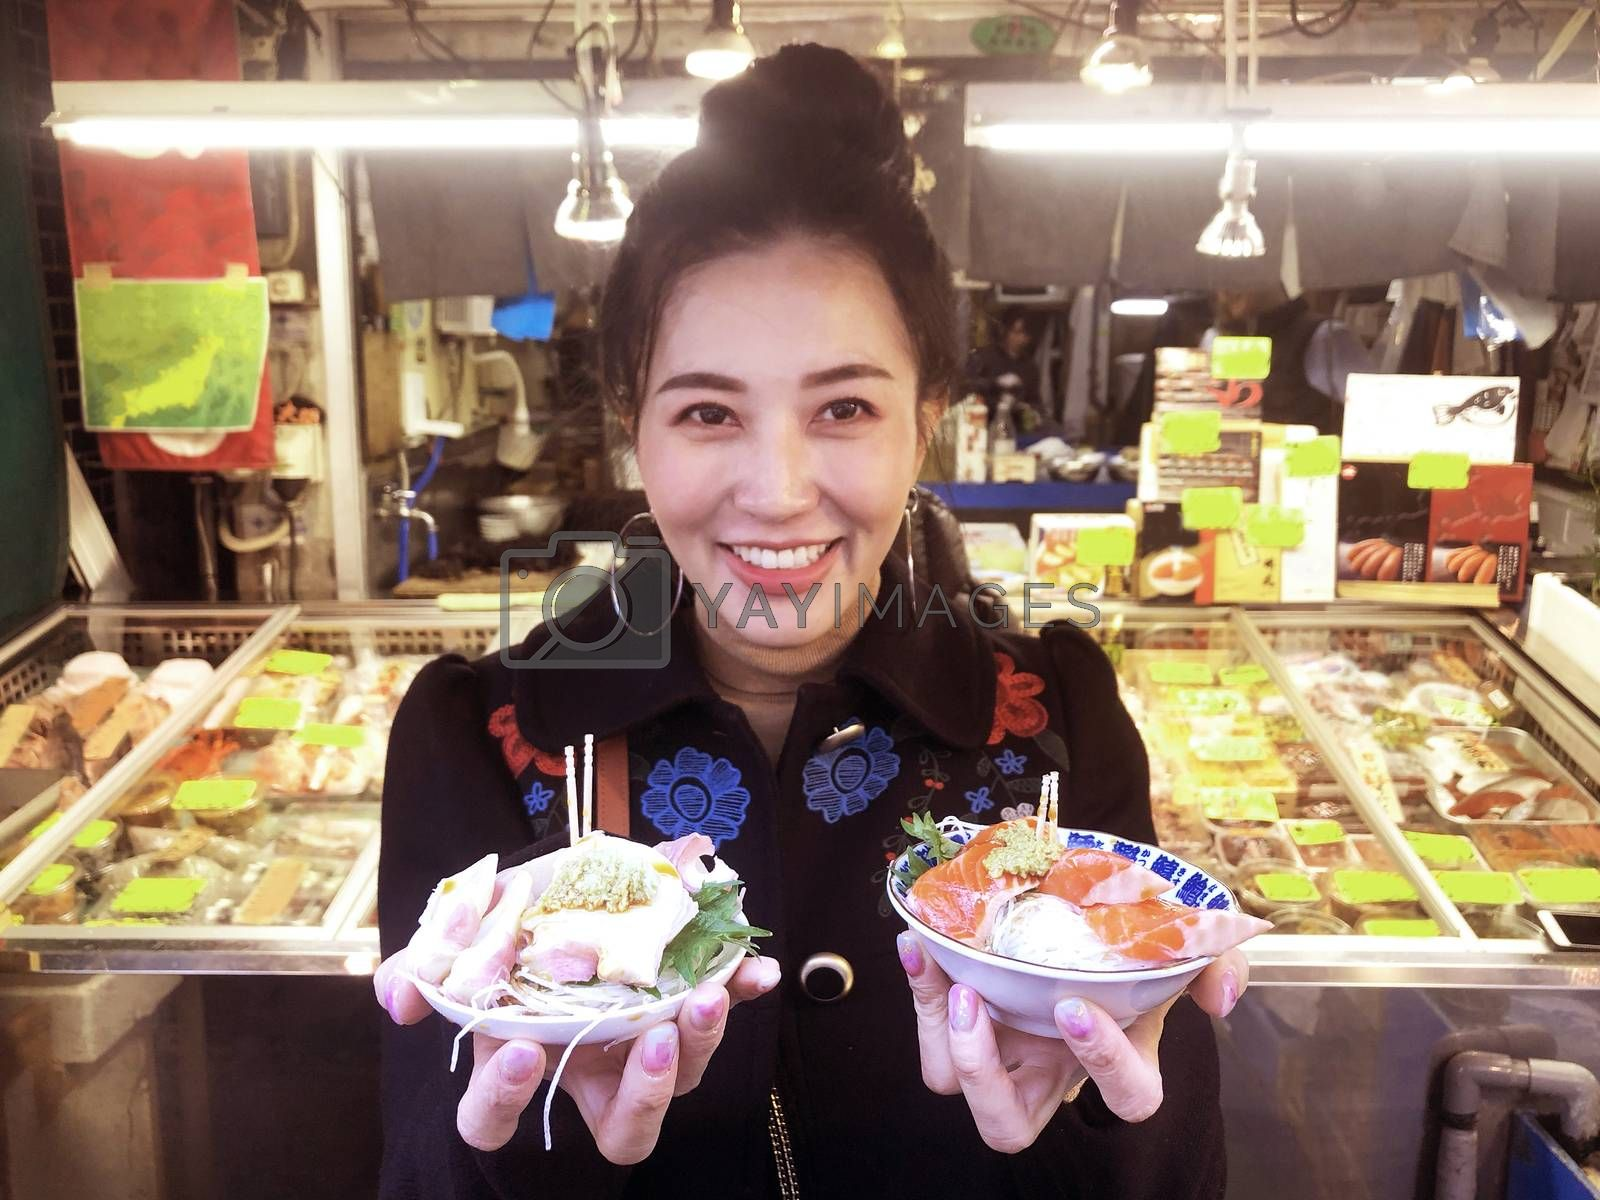 Tourist woman showing salmon sashimi most popular delicious food in street food tsukiji fish market, Japan